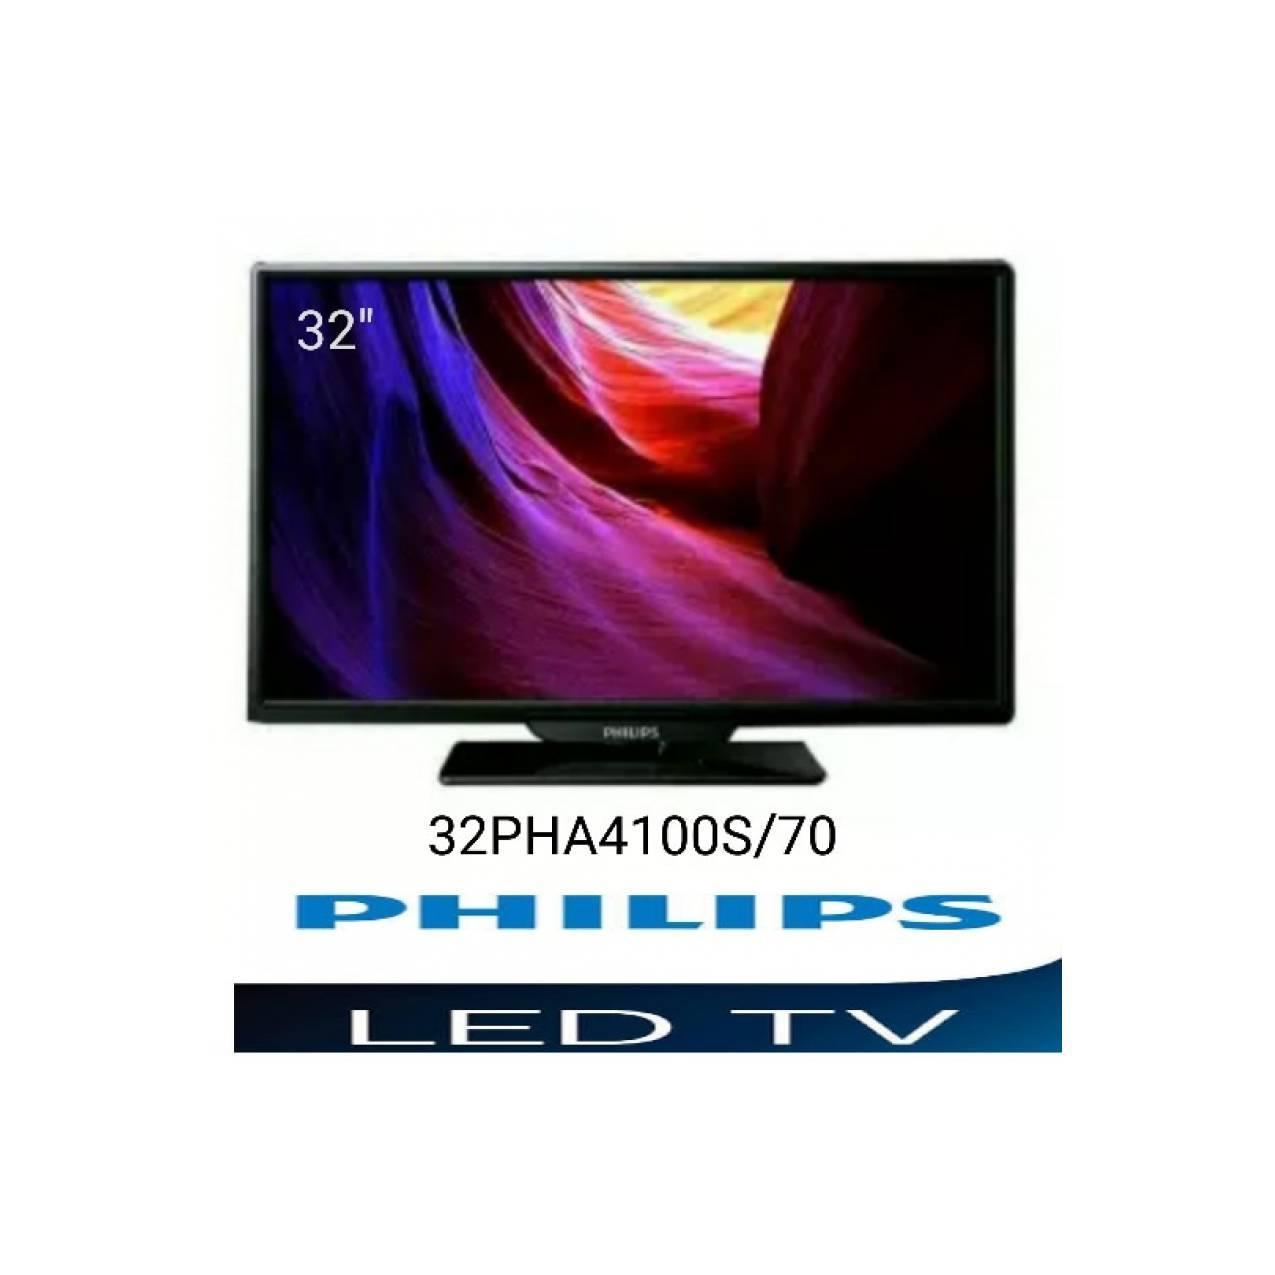 PHILIPS 32PHA4100S/70 LED TV 32INCH - USB MOVIE